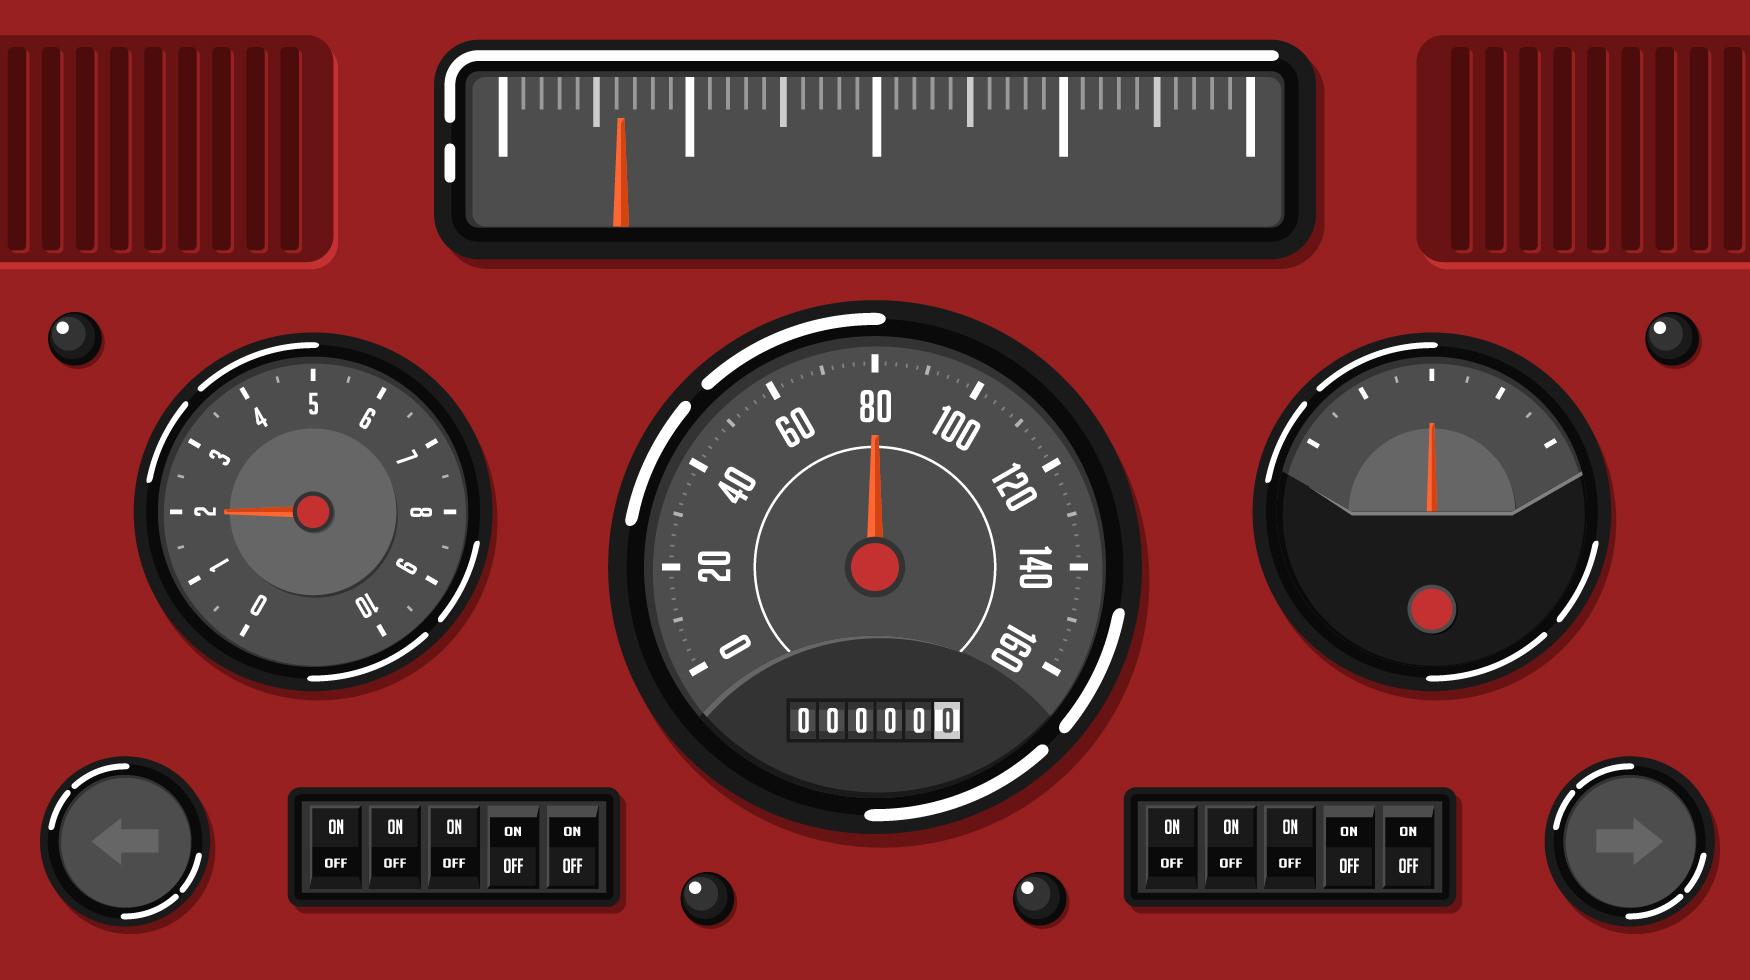 Old Car Dashboard UI Free Vector - Download Free Vectors ...